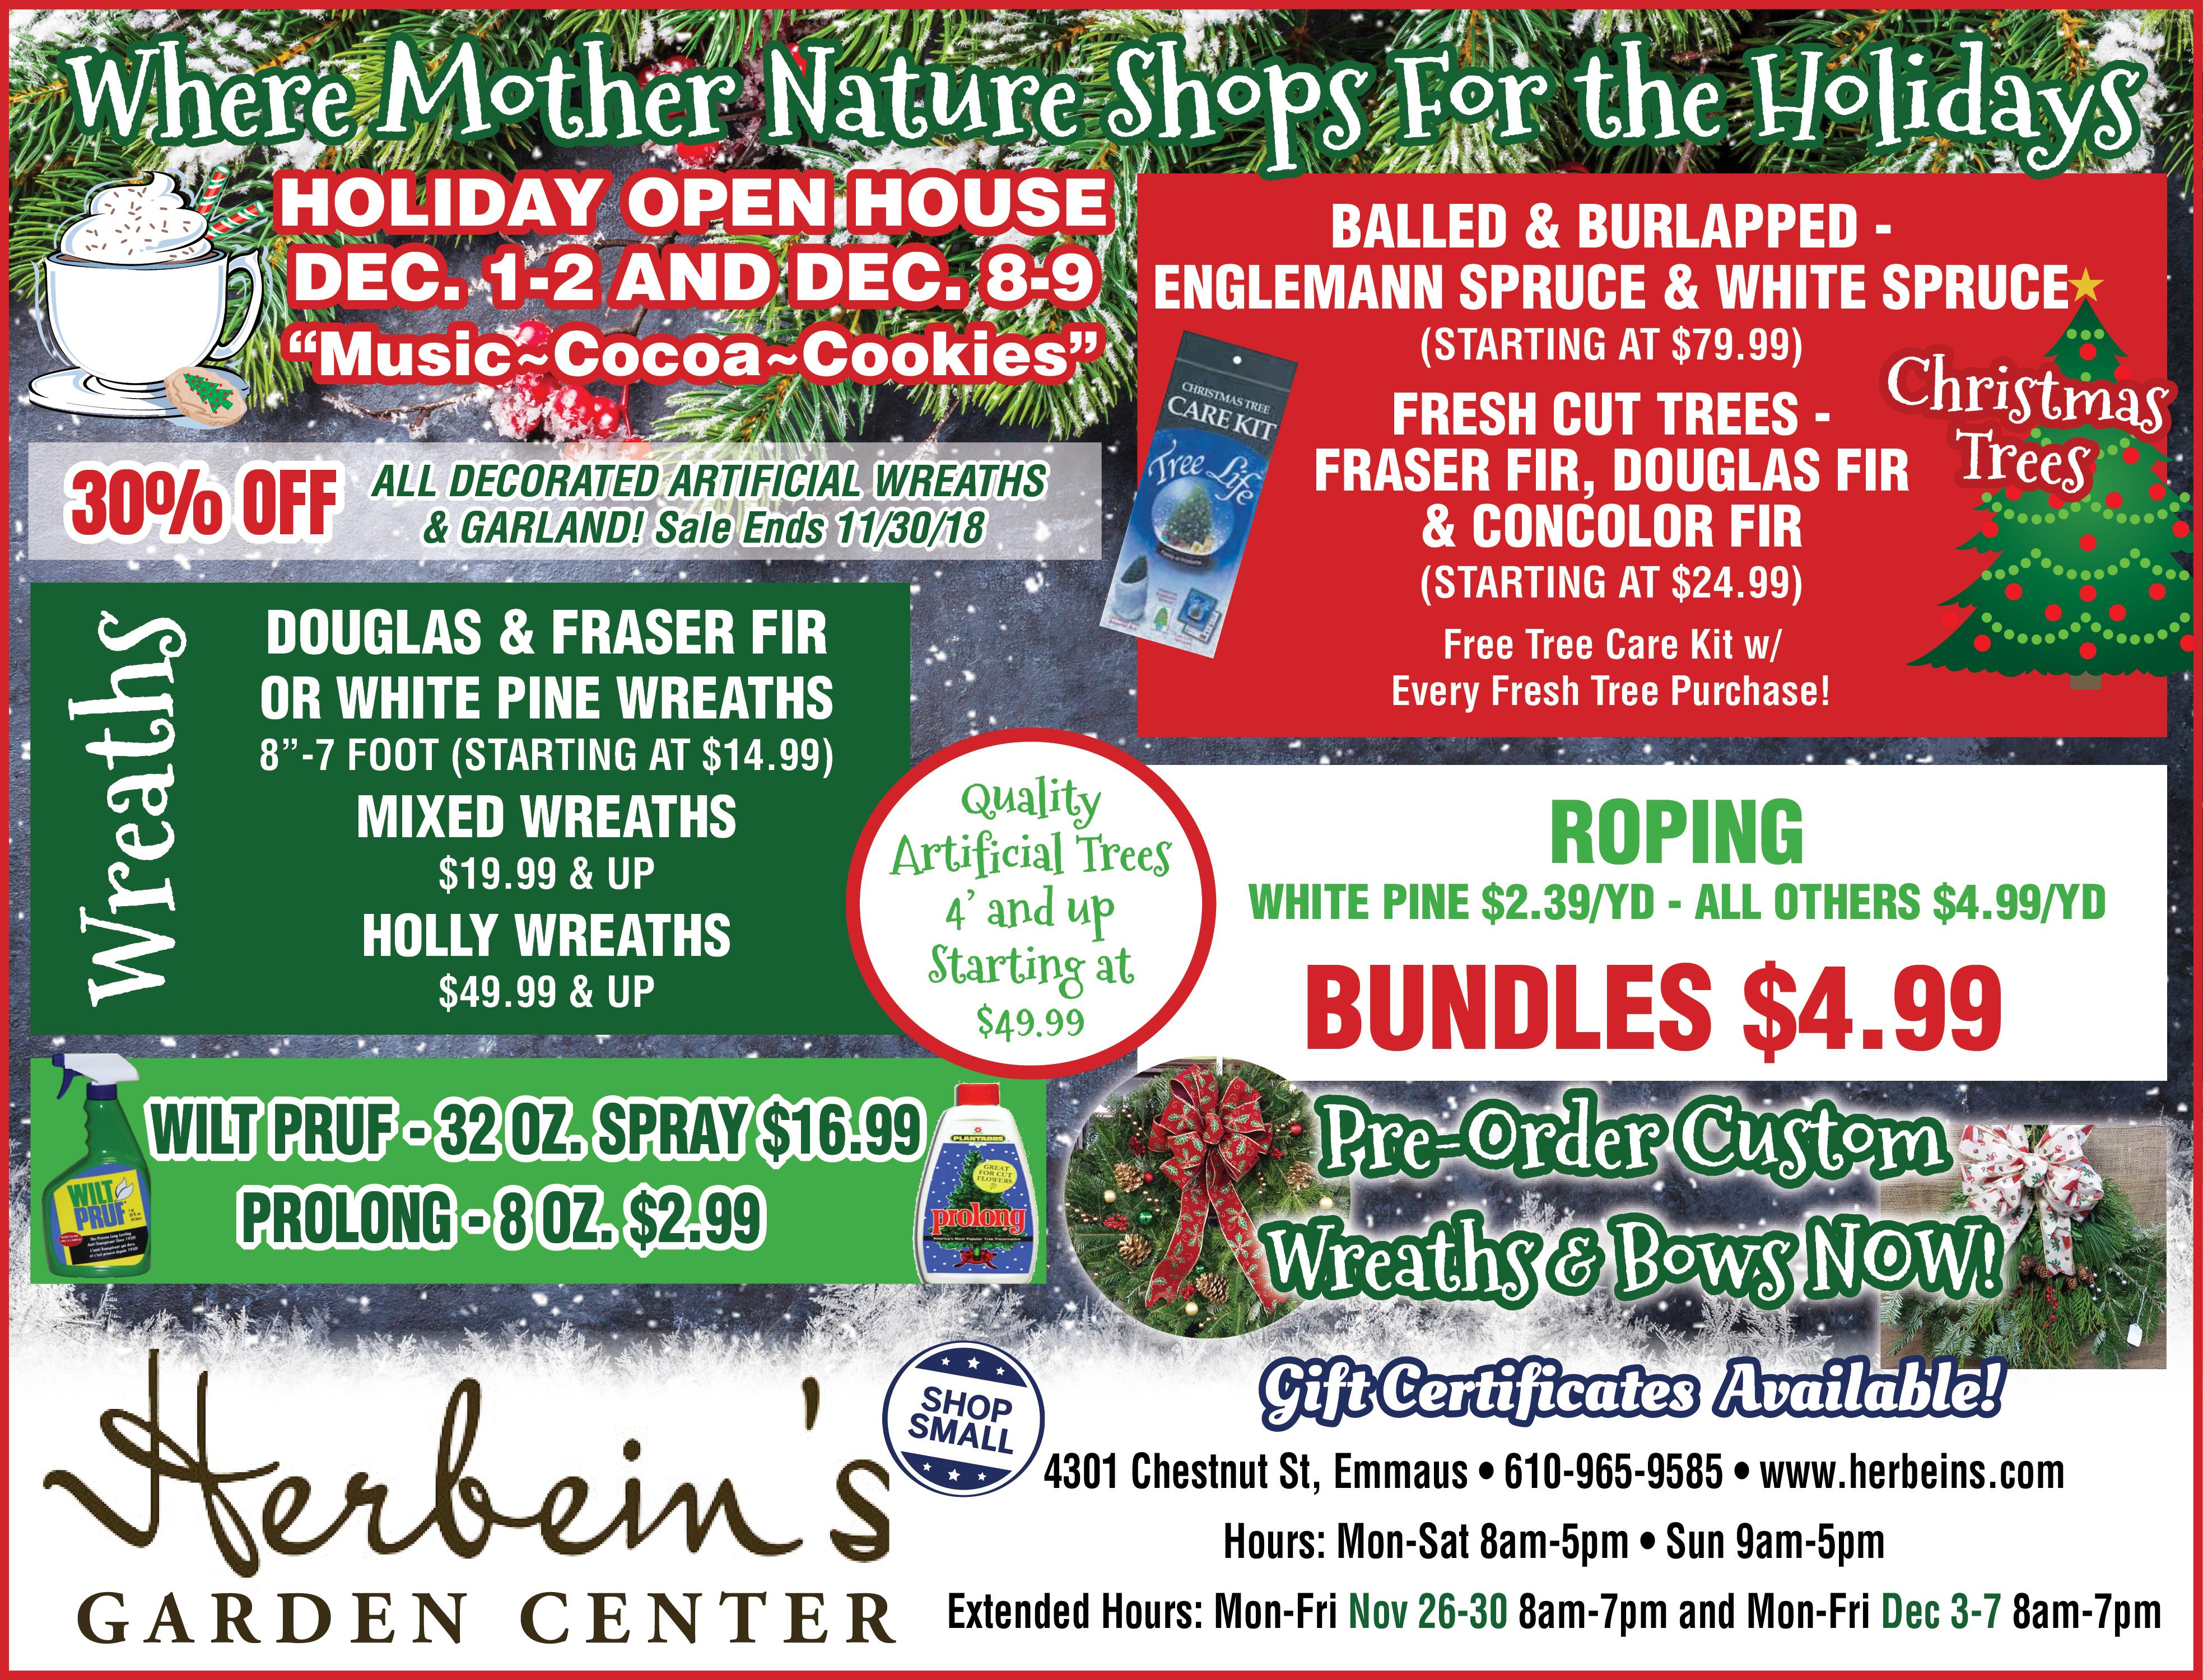 Herbeins Garden Center Ad for week of 11/27-12/03/2018